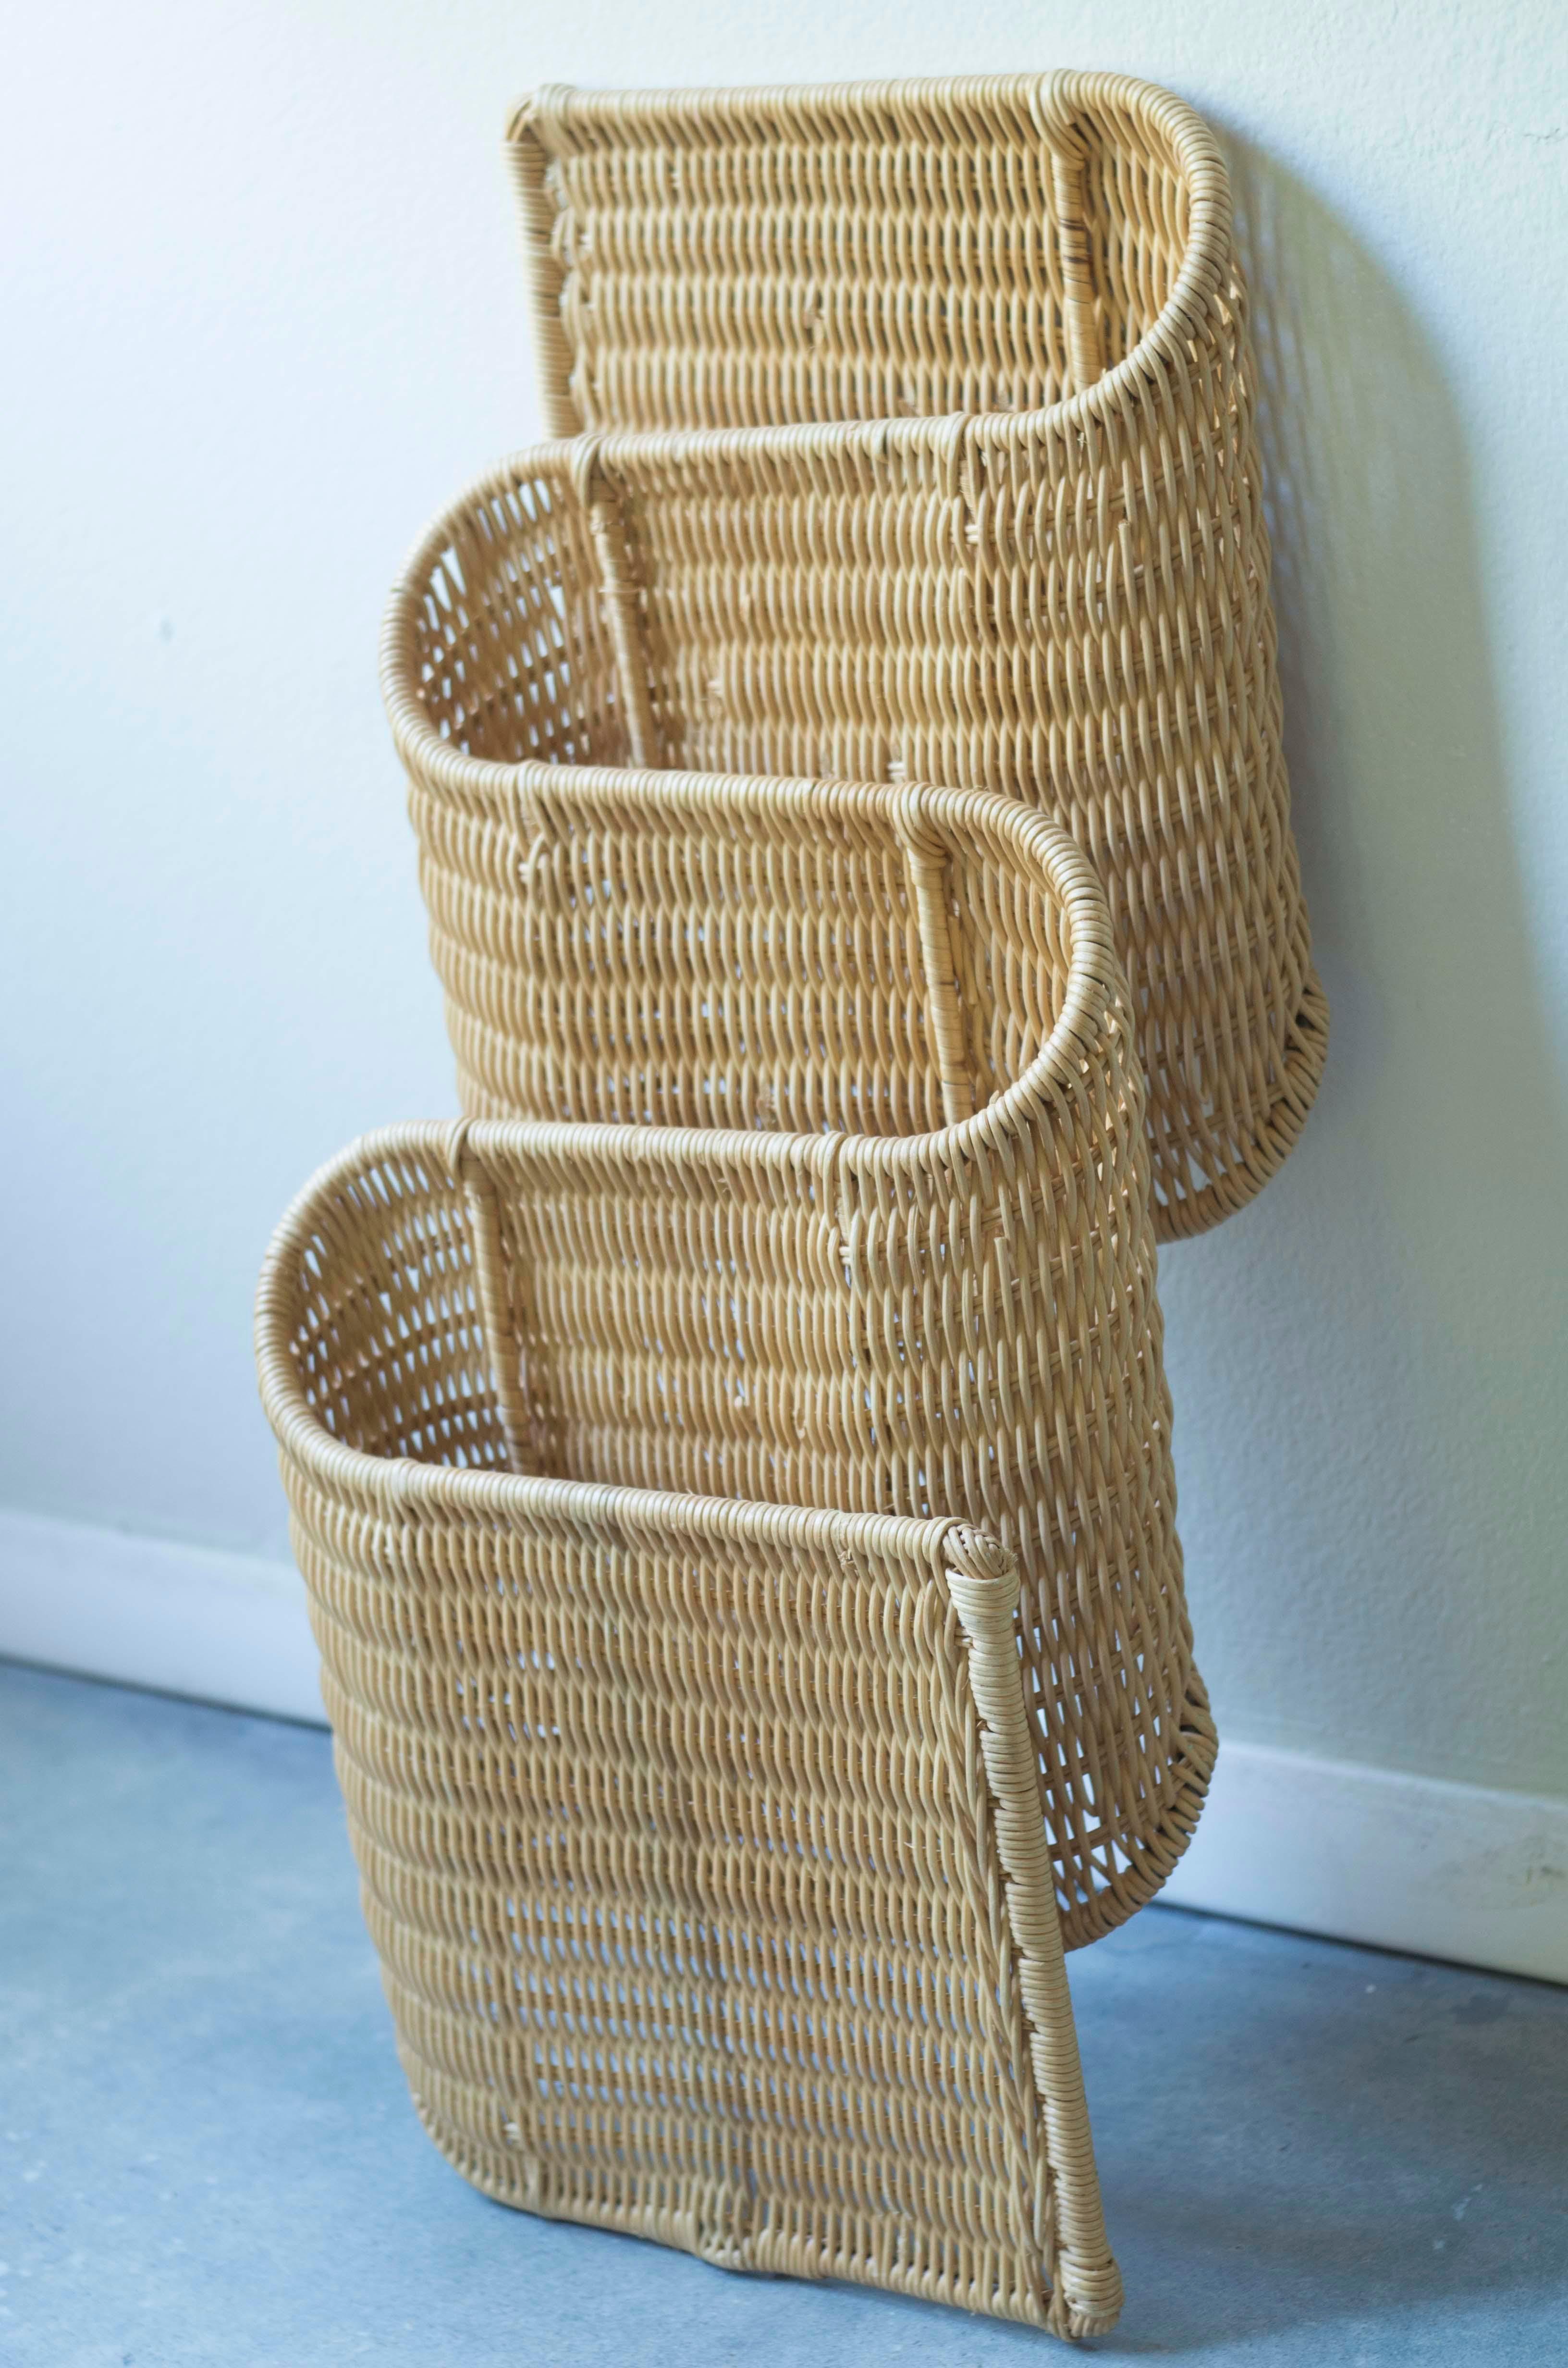 image of vintage wicker biomorphic wall magazine rack